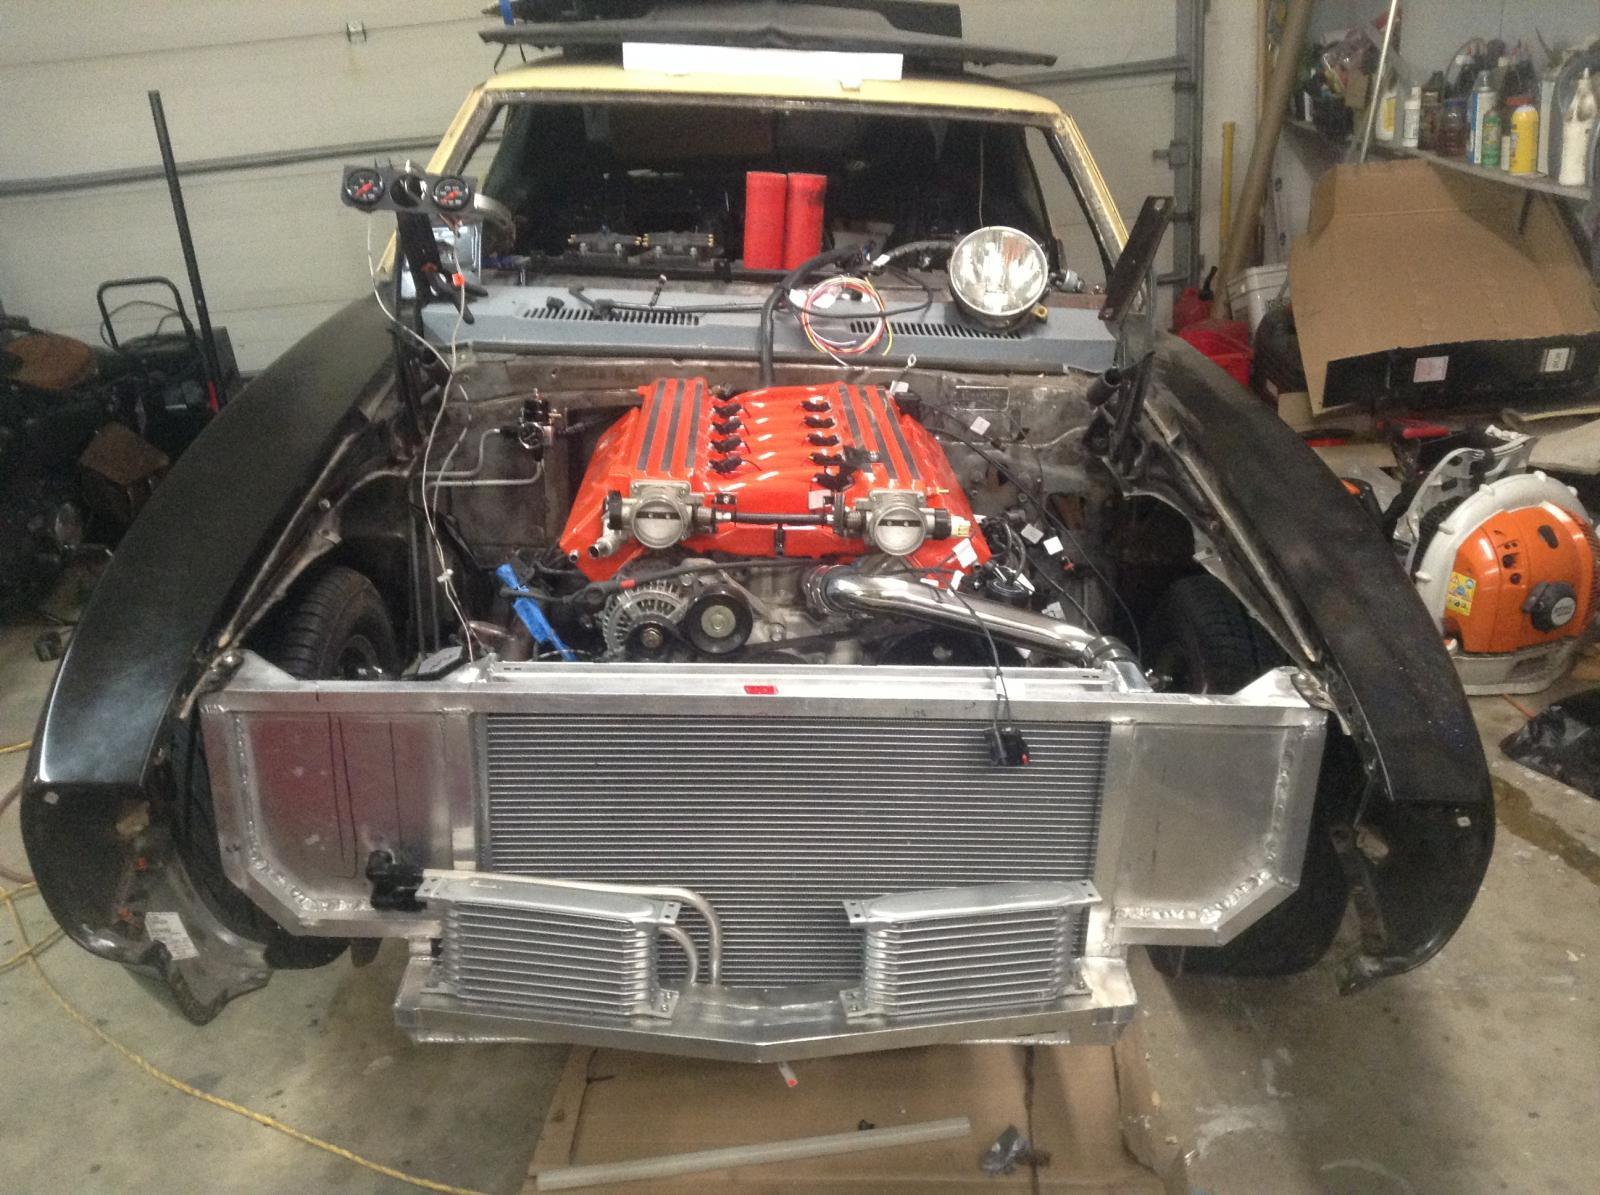 1968 camaro with a viper v10 engine swap depot rh engineswapdepot com viper engine swap challenger viper motor swap